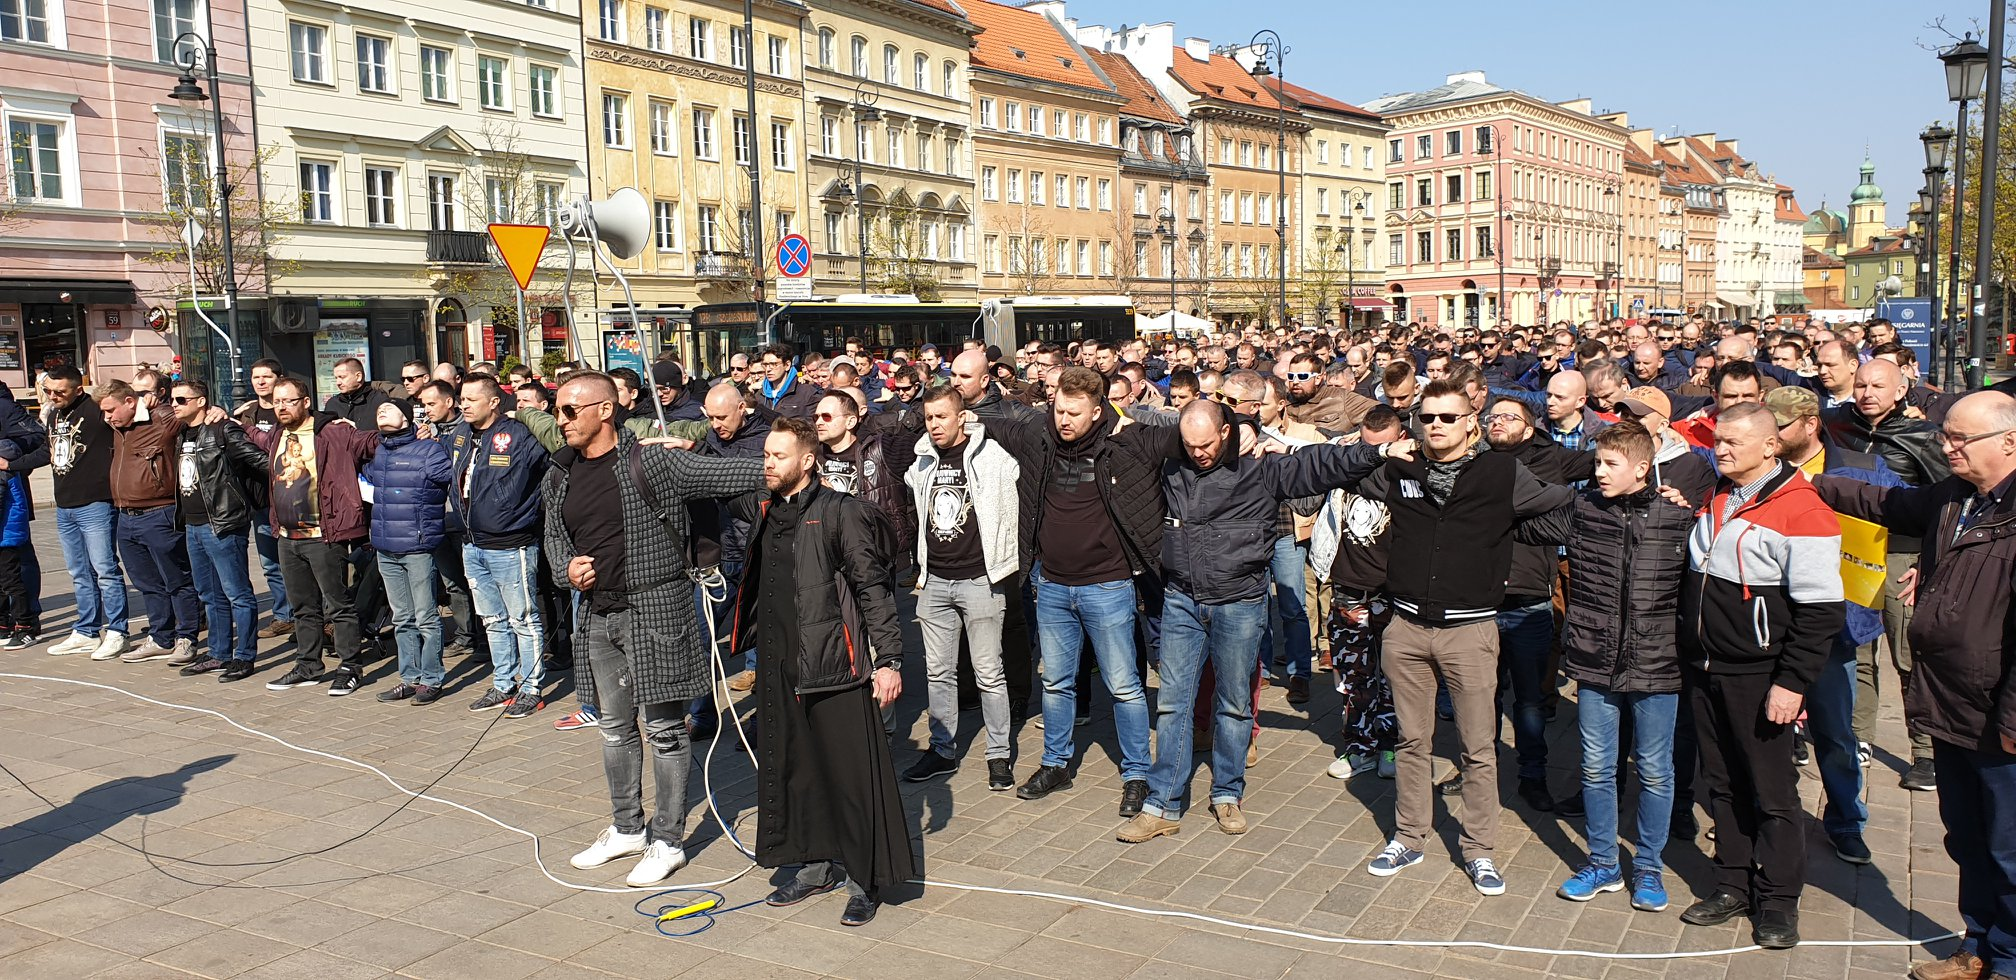 MAN,ROSARY,WARSAW,POLAND